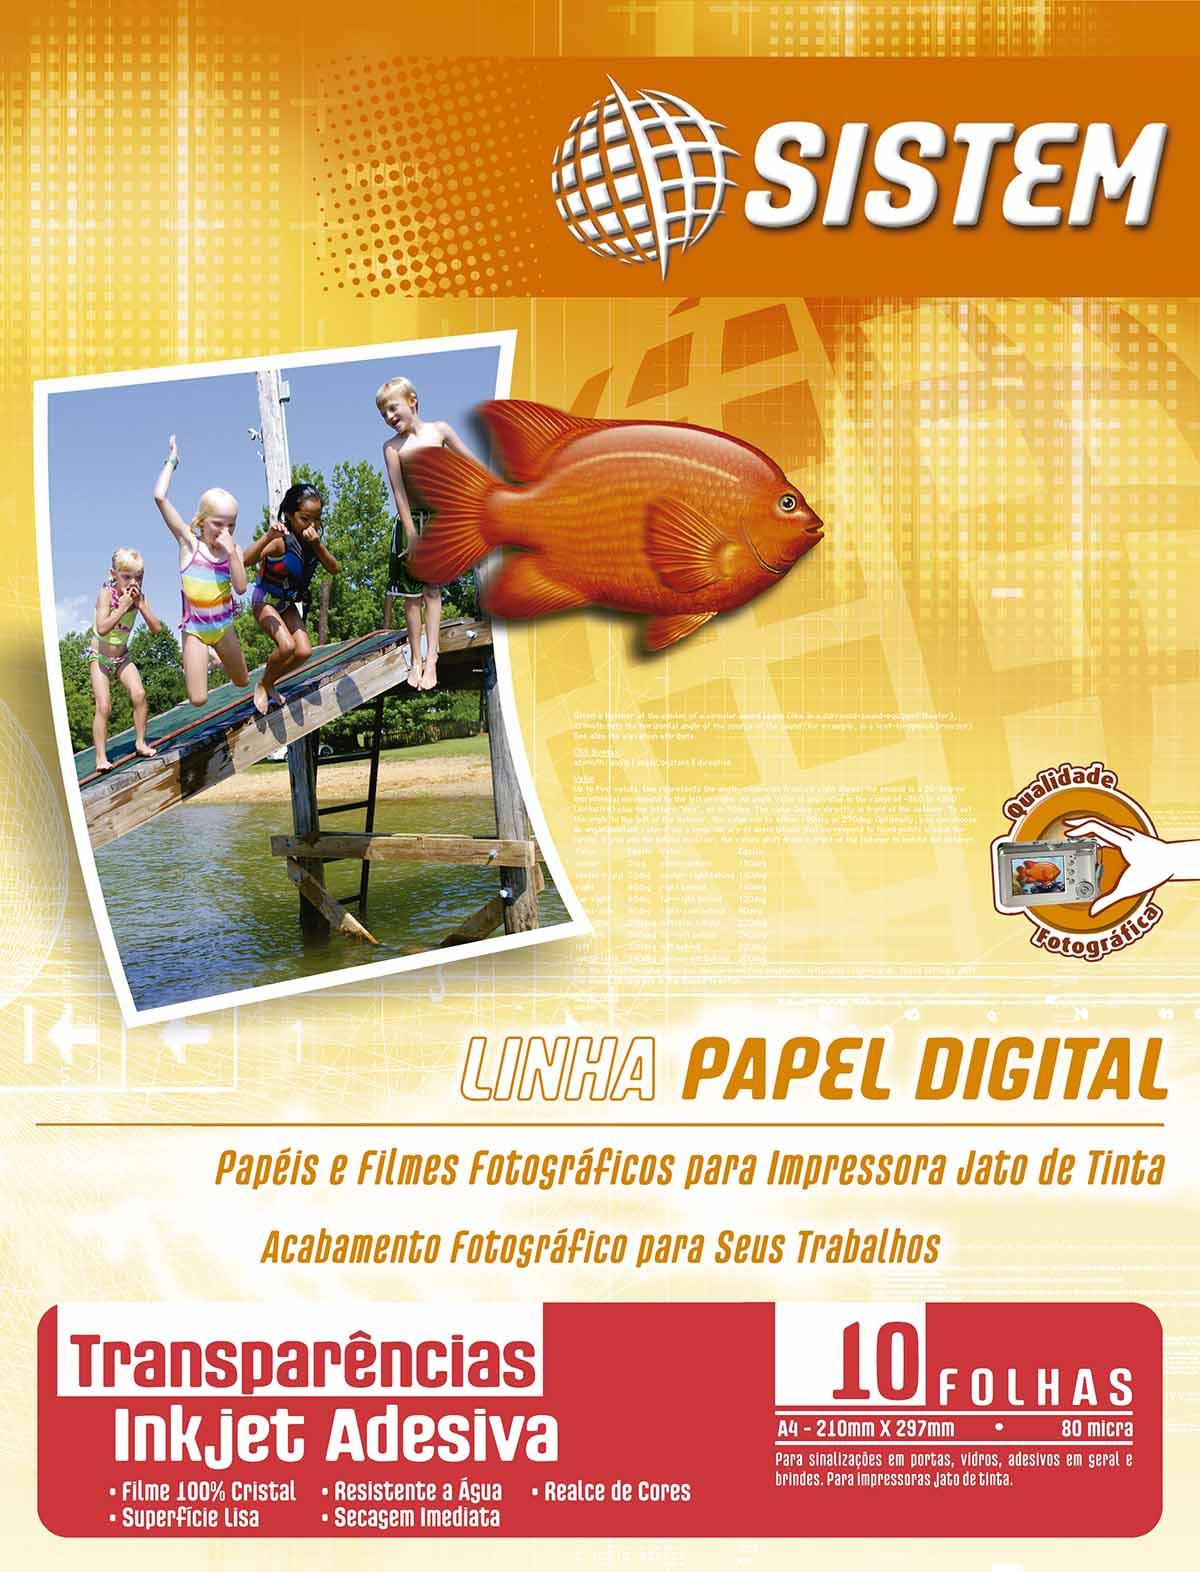 TRANSPARÊNCIA ADESIVA Inkjet (Vinil Adesivo) | 10 Folhas| A4 | 80 micra